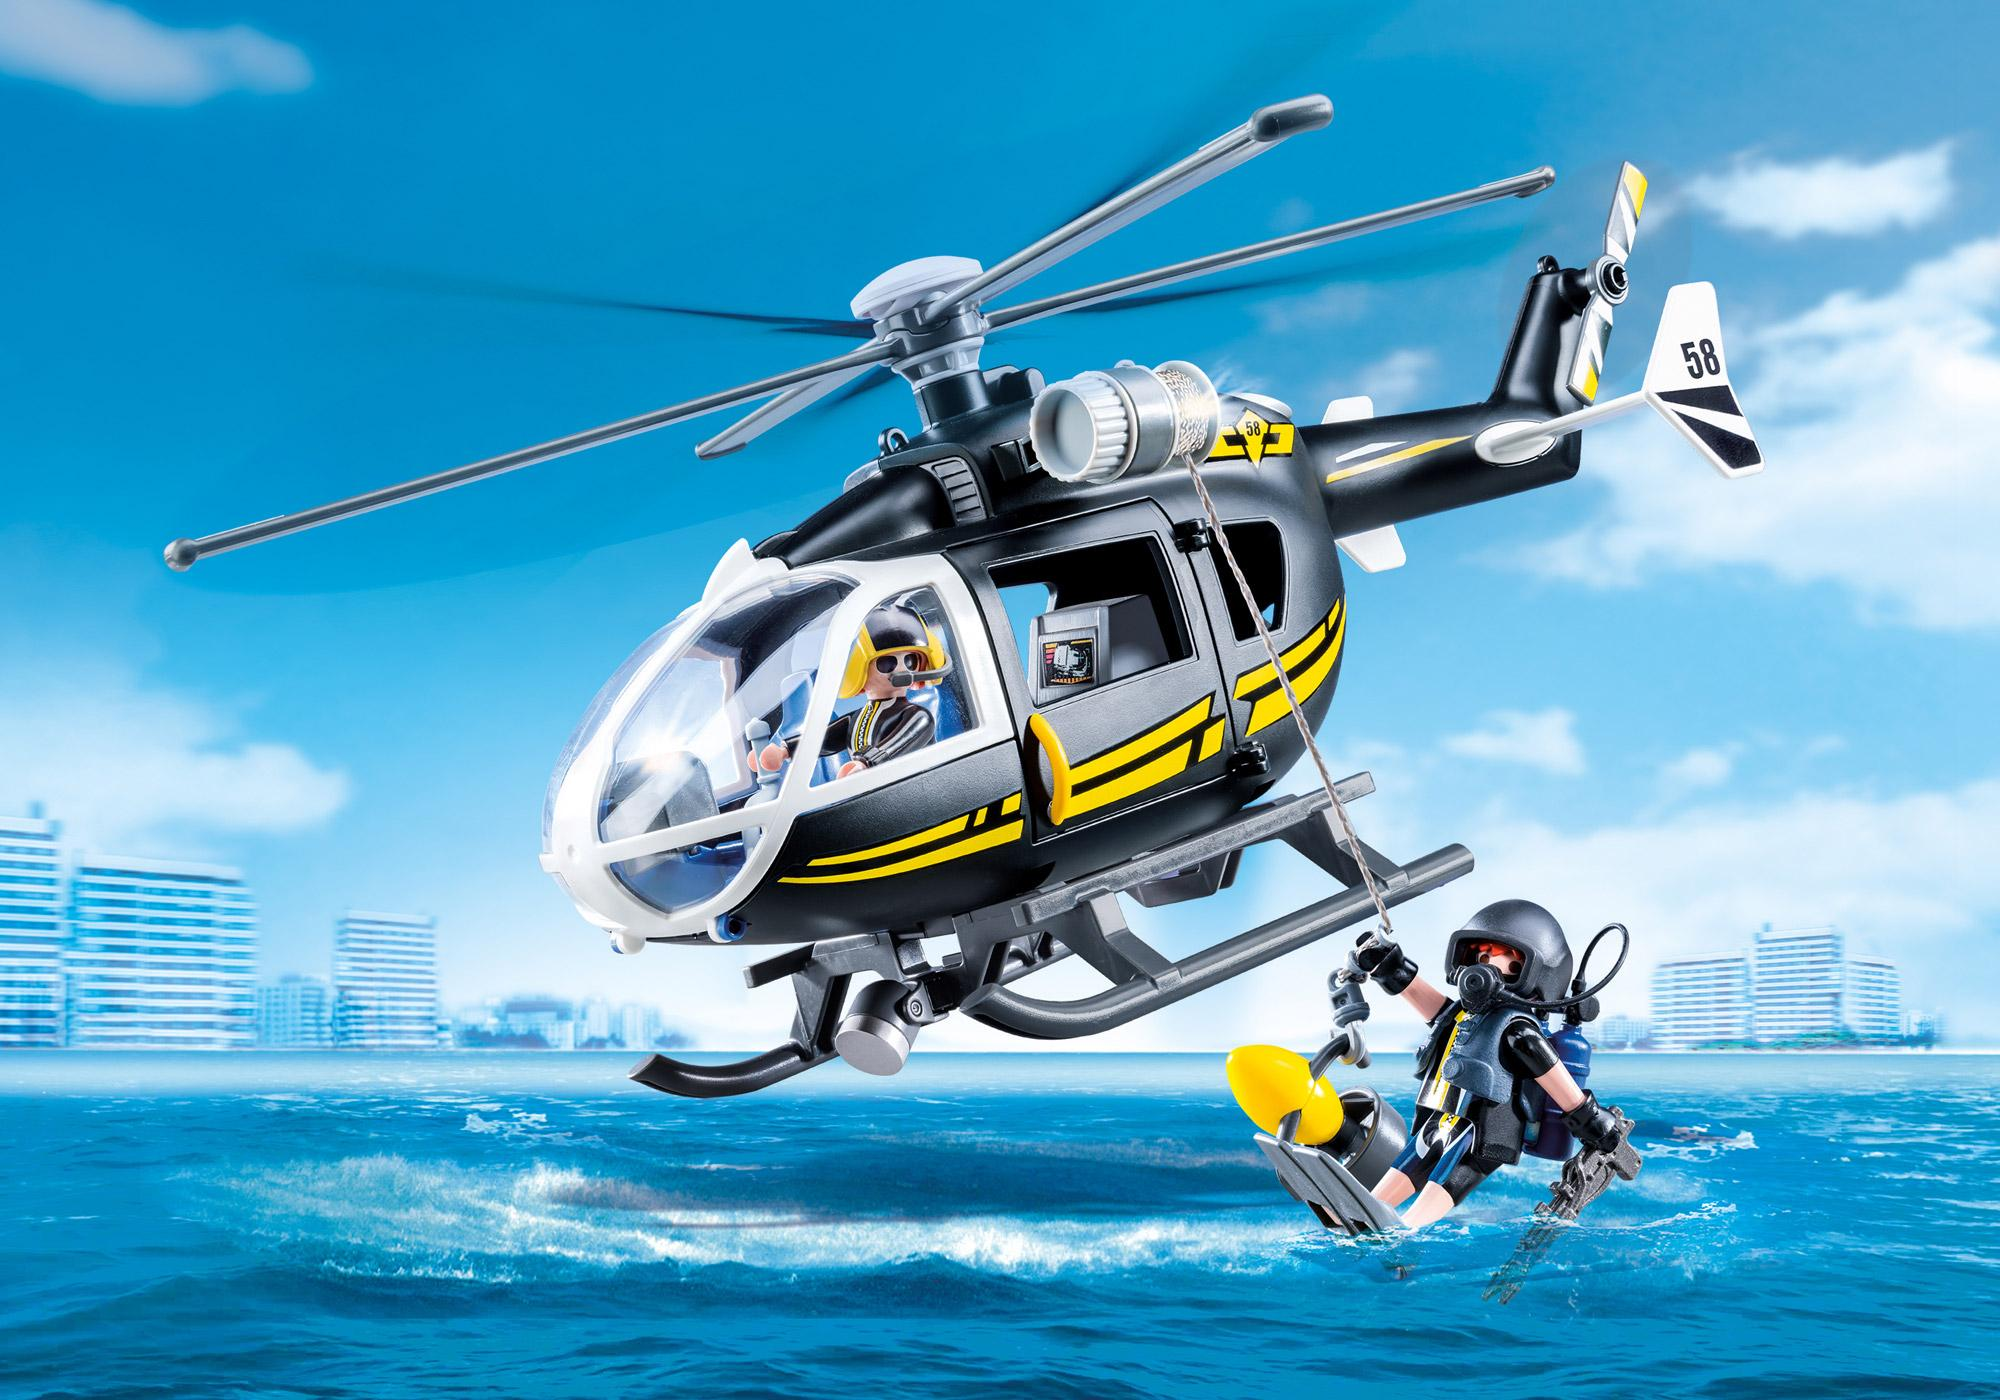 9363_product_detail/Ελικόπτερο Ομάδας Ειδικών Αποστολών